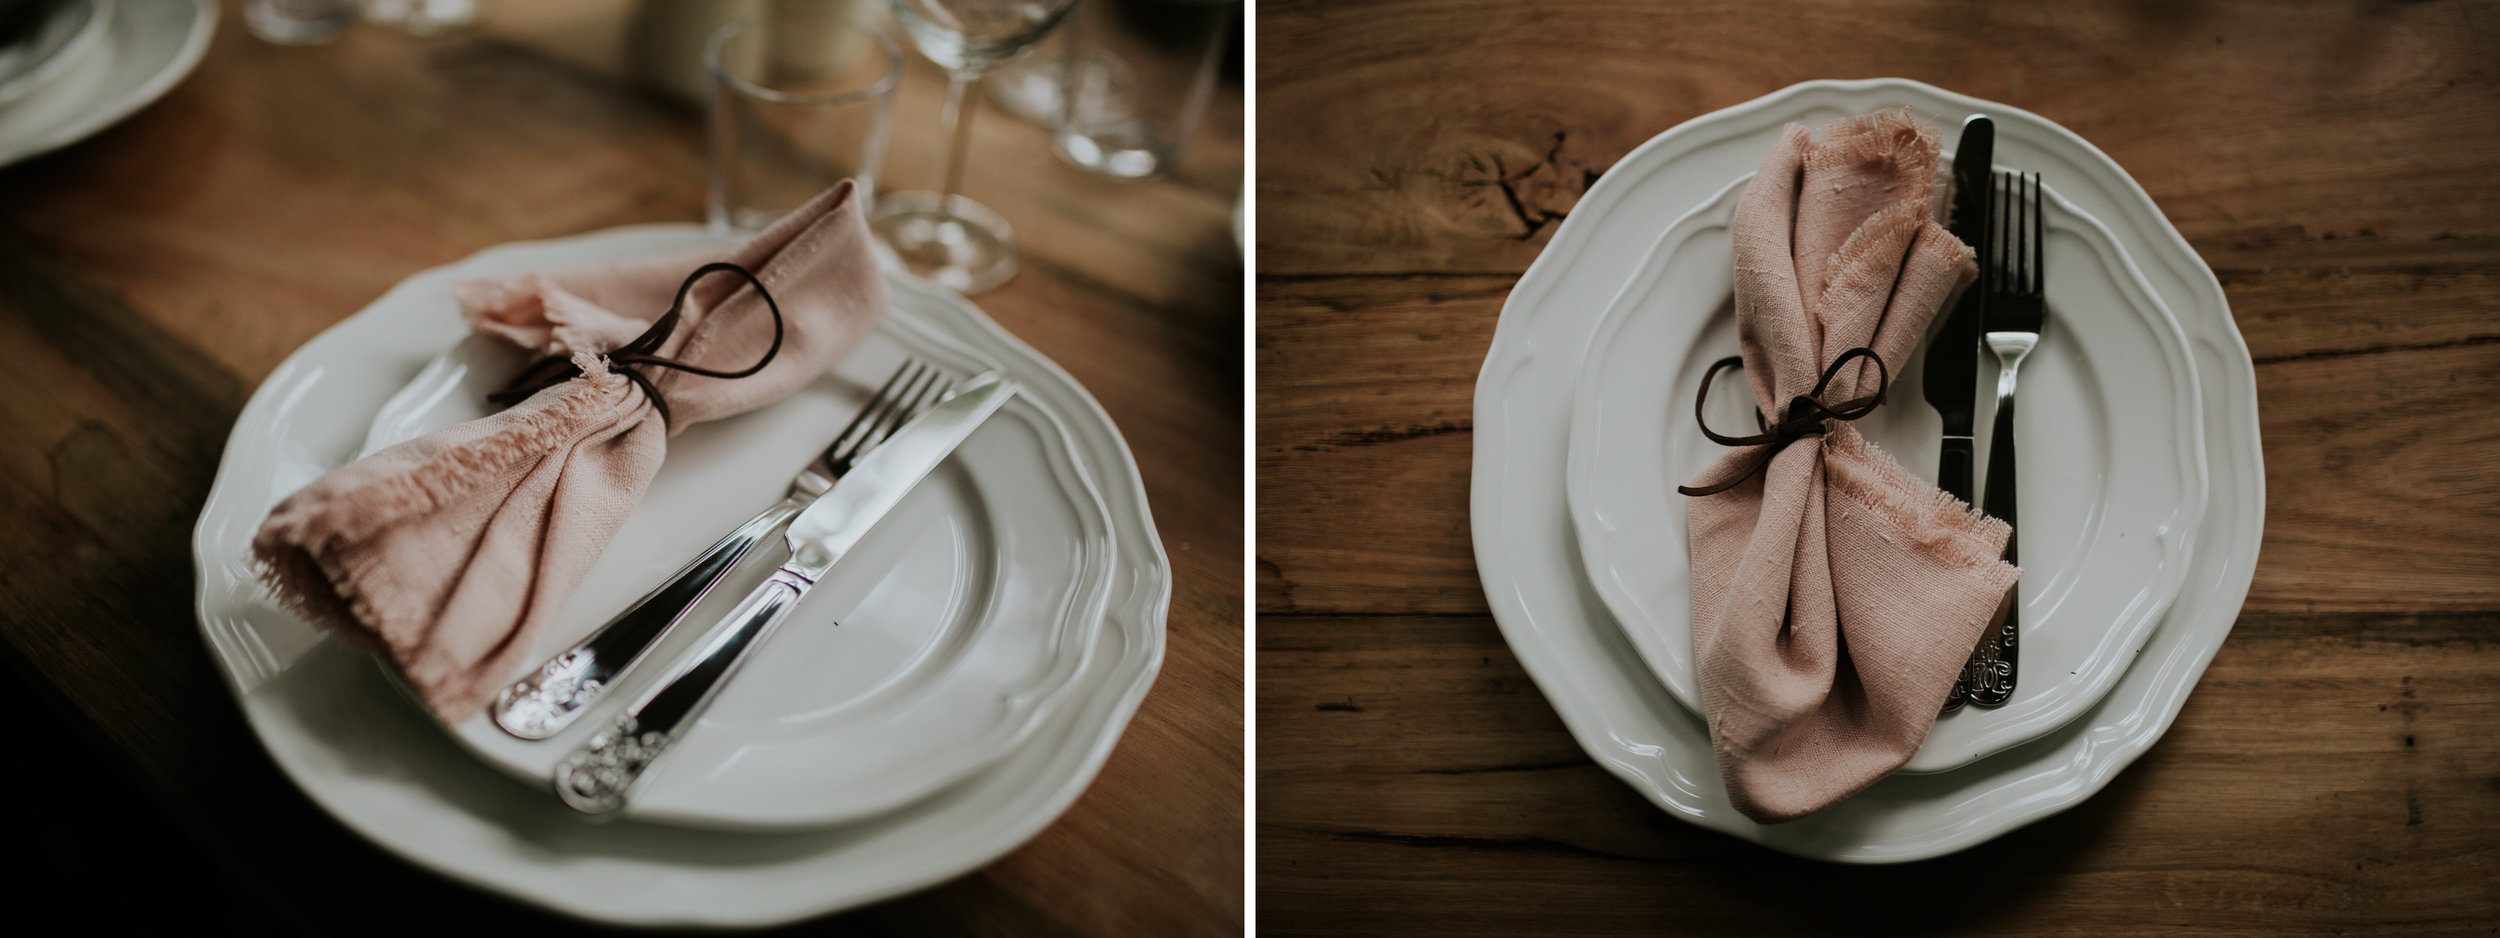 Emma+John+Plate+Table+Styling+Wedding.jpg